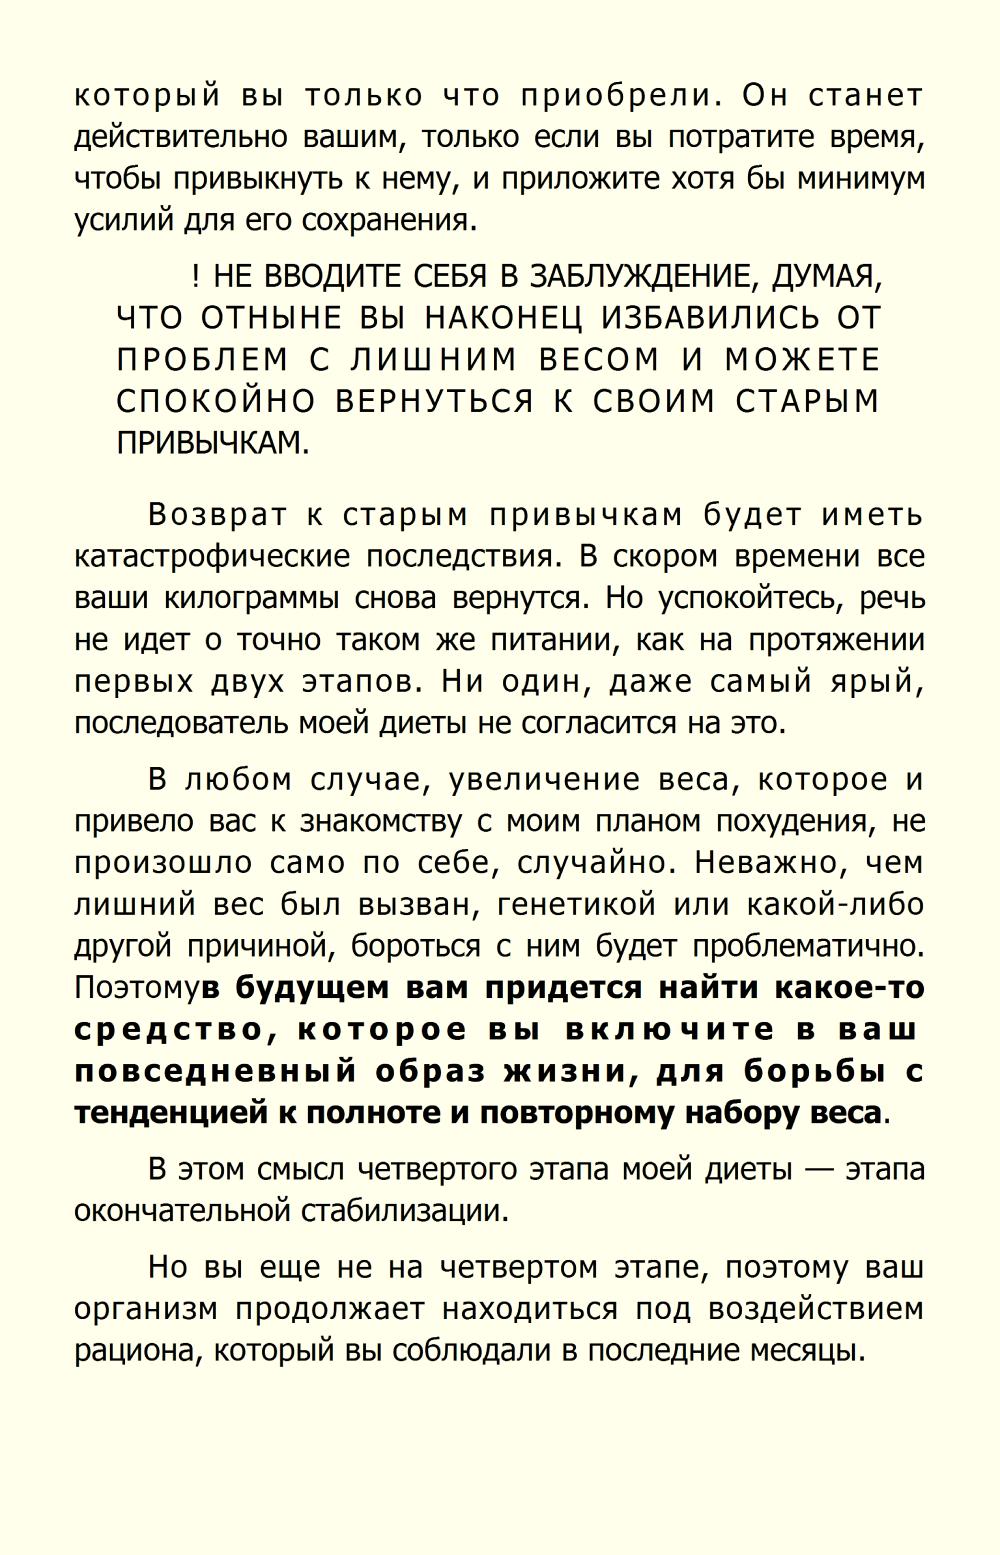 http://i6.imageban.ru/out/2014/01/21/eb13a7cbdf9b6c2342d853e02fb56845.jpg